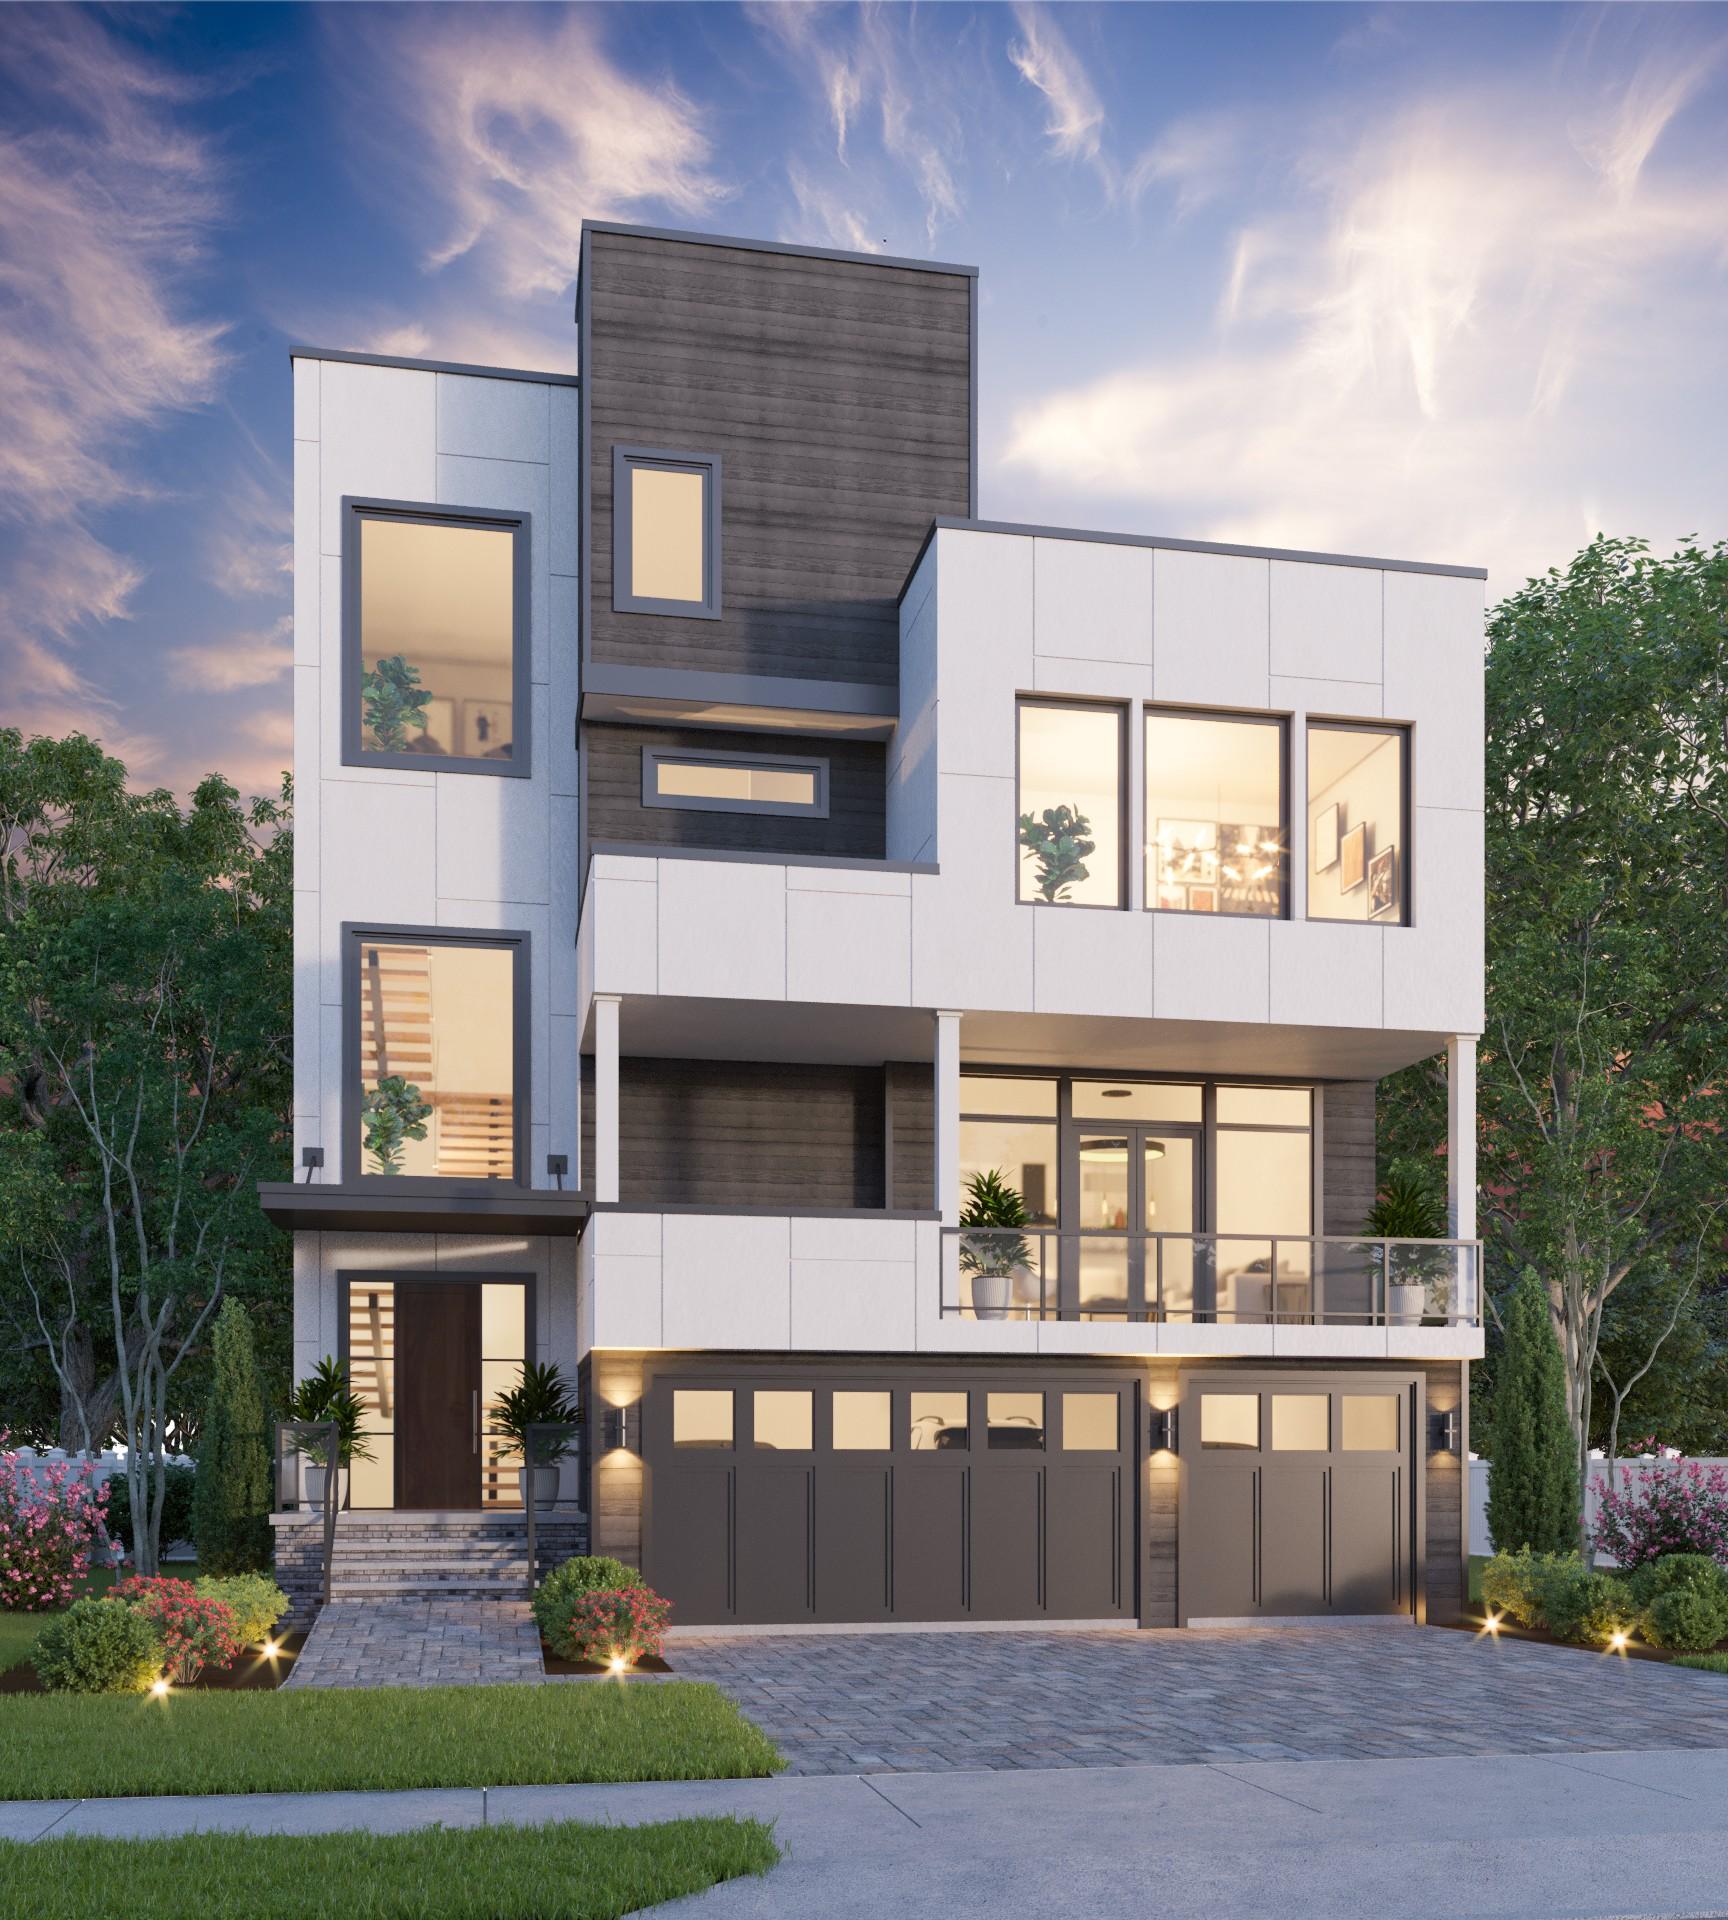 1000B 9th Ave S Property Photo - Nashville, TN real estate listing